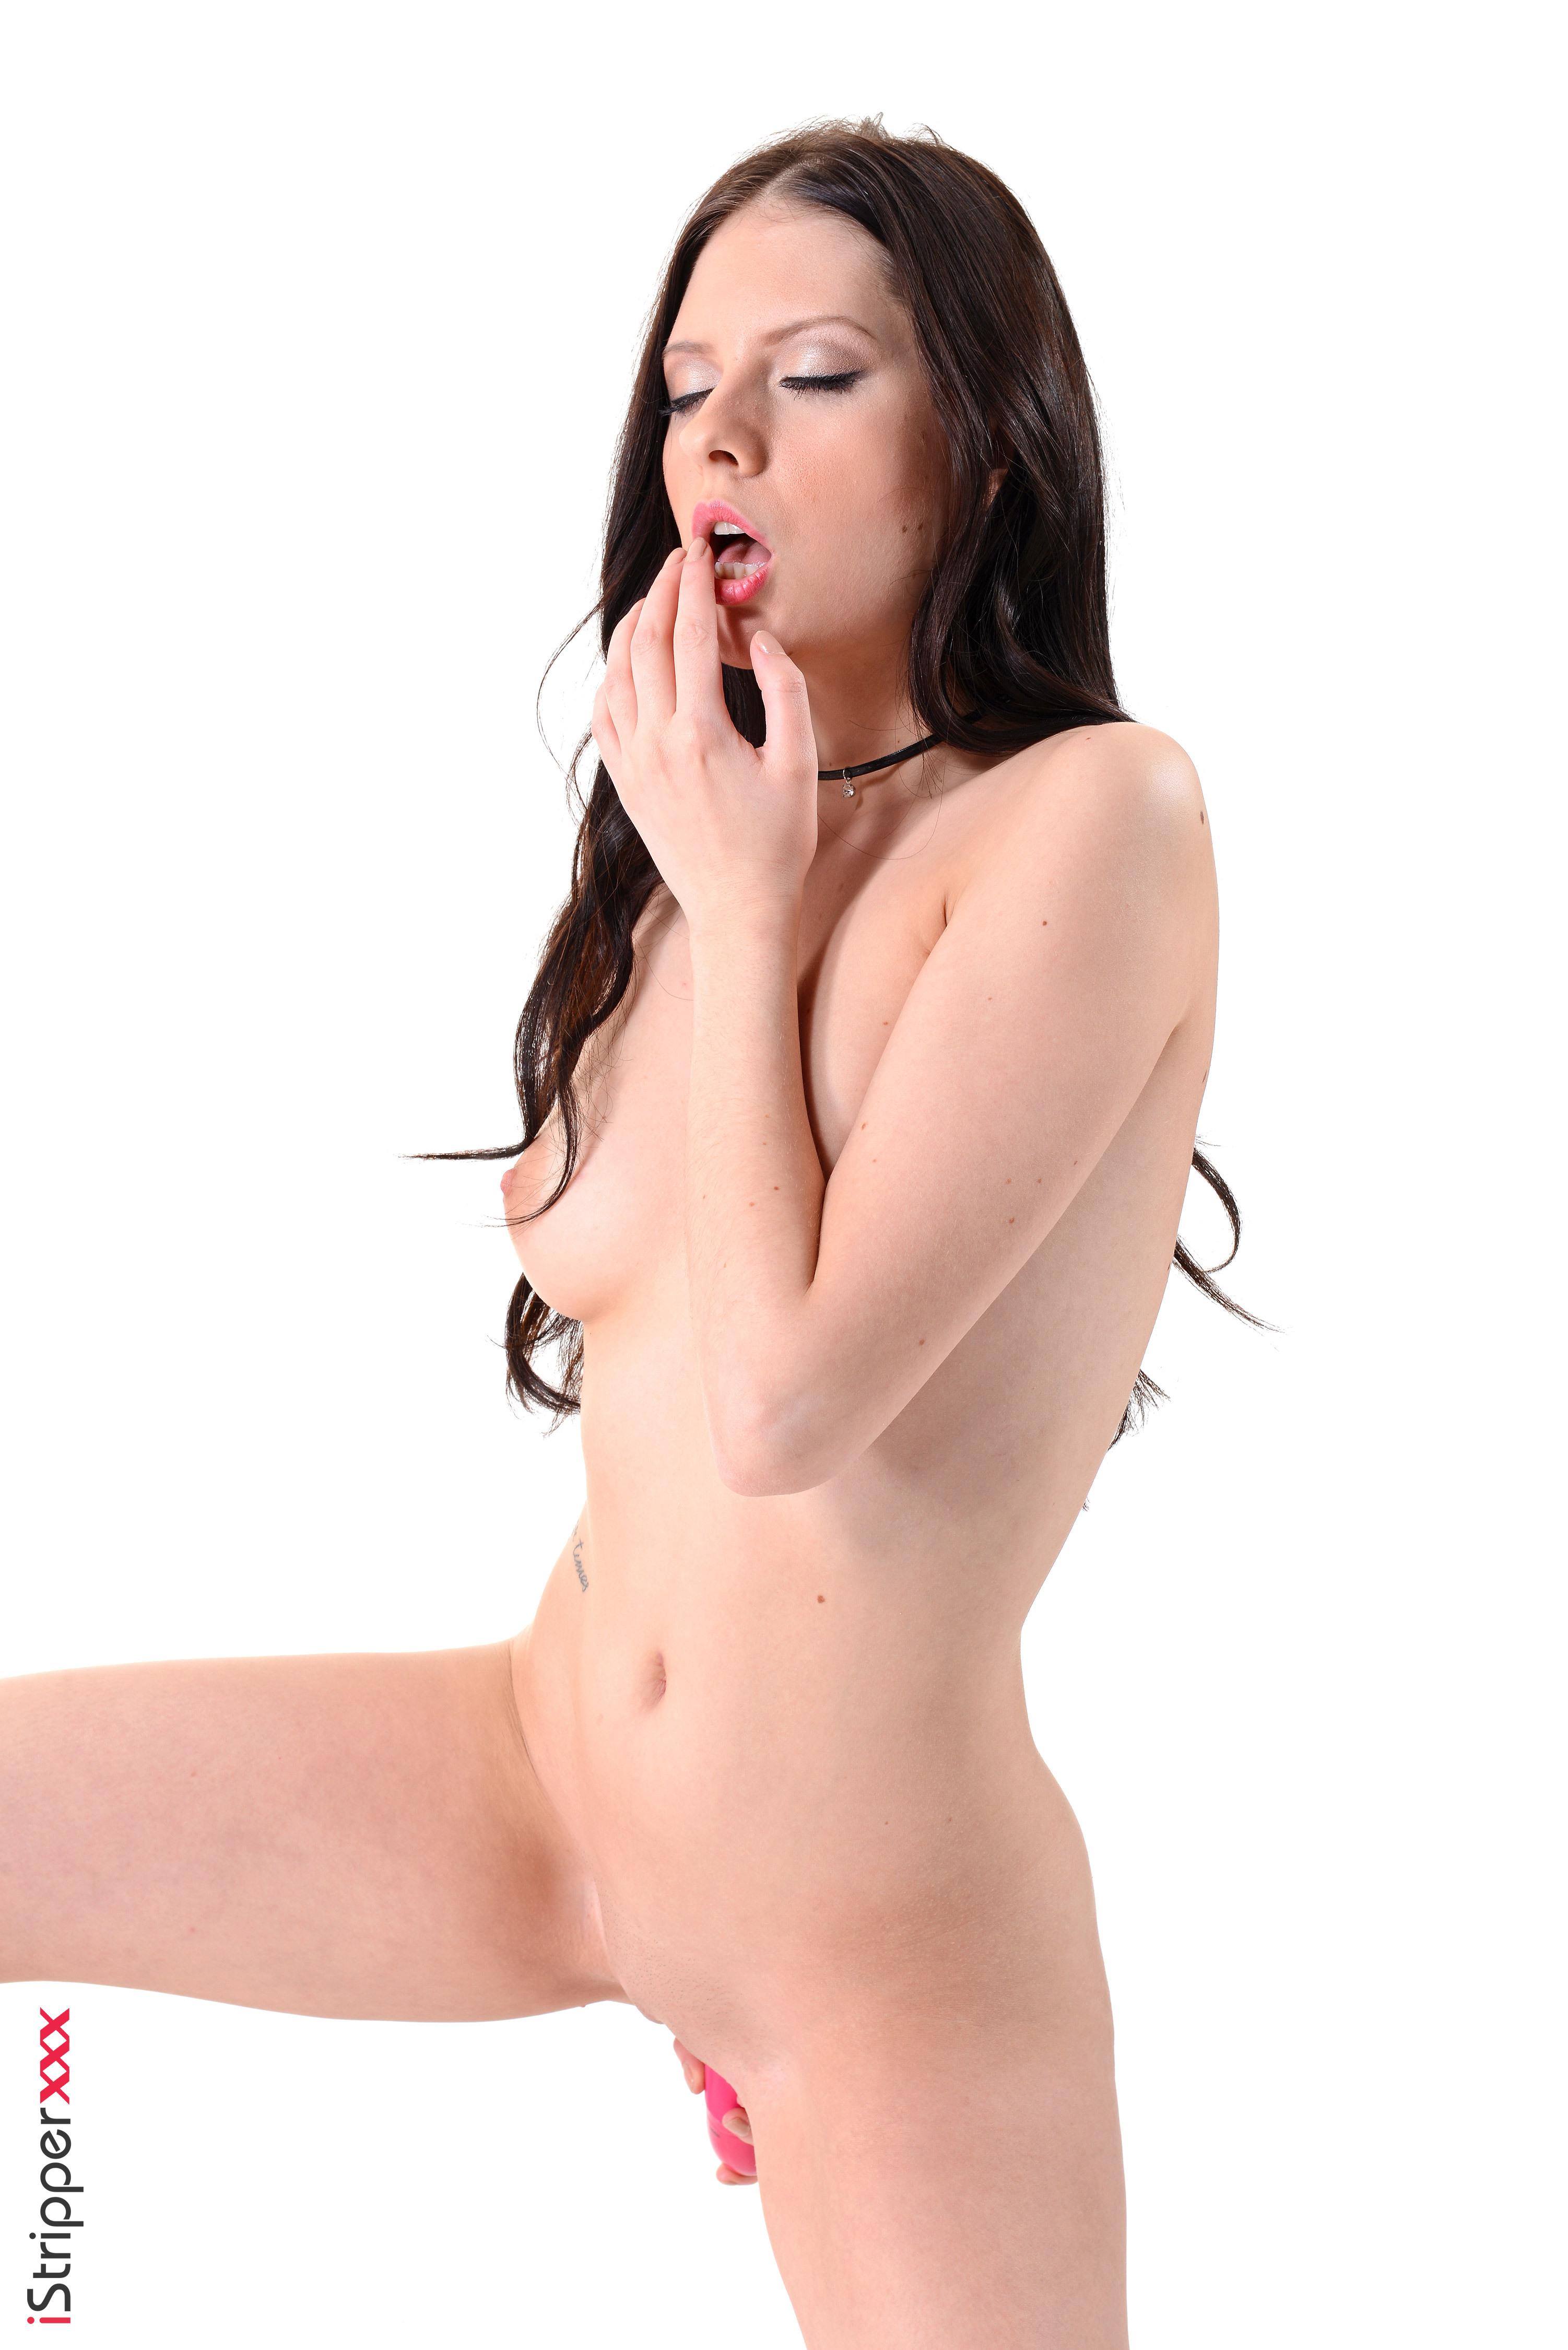 hot girls stripping off